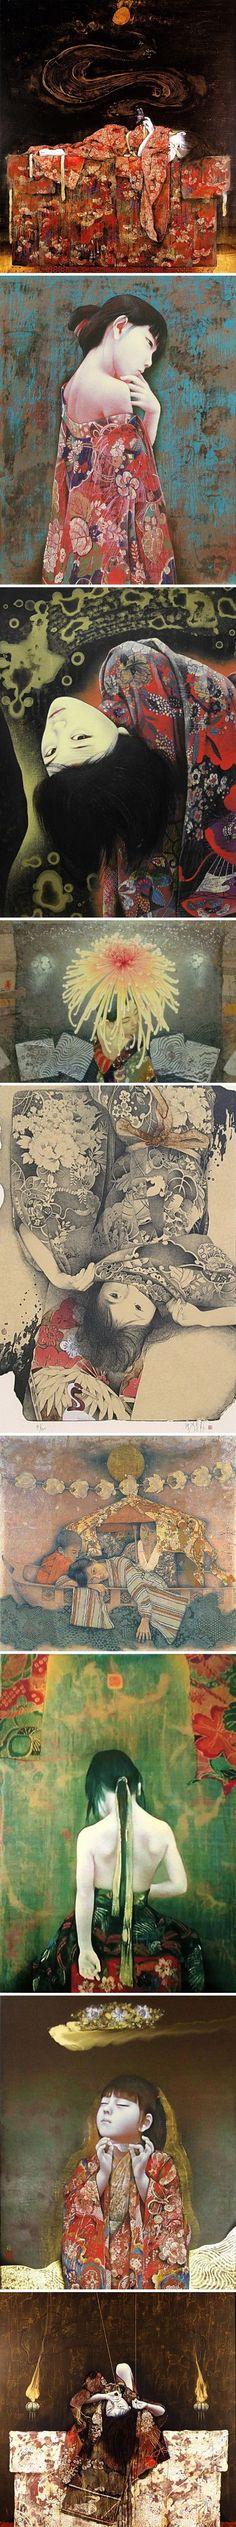 Island of narcissism: Kyosuke Tinai